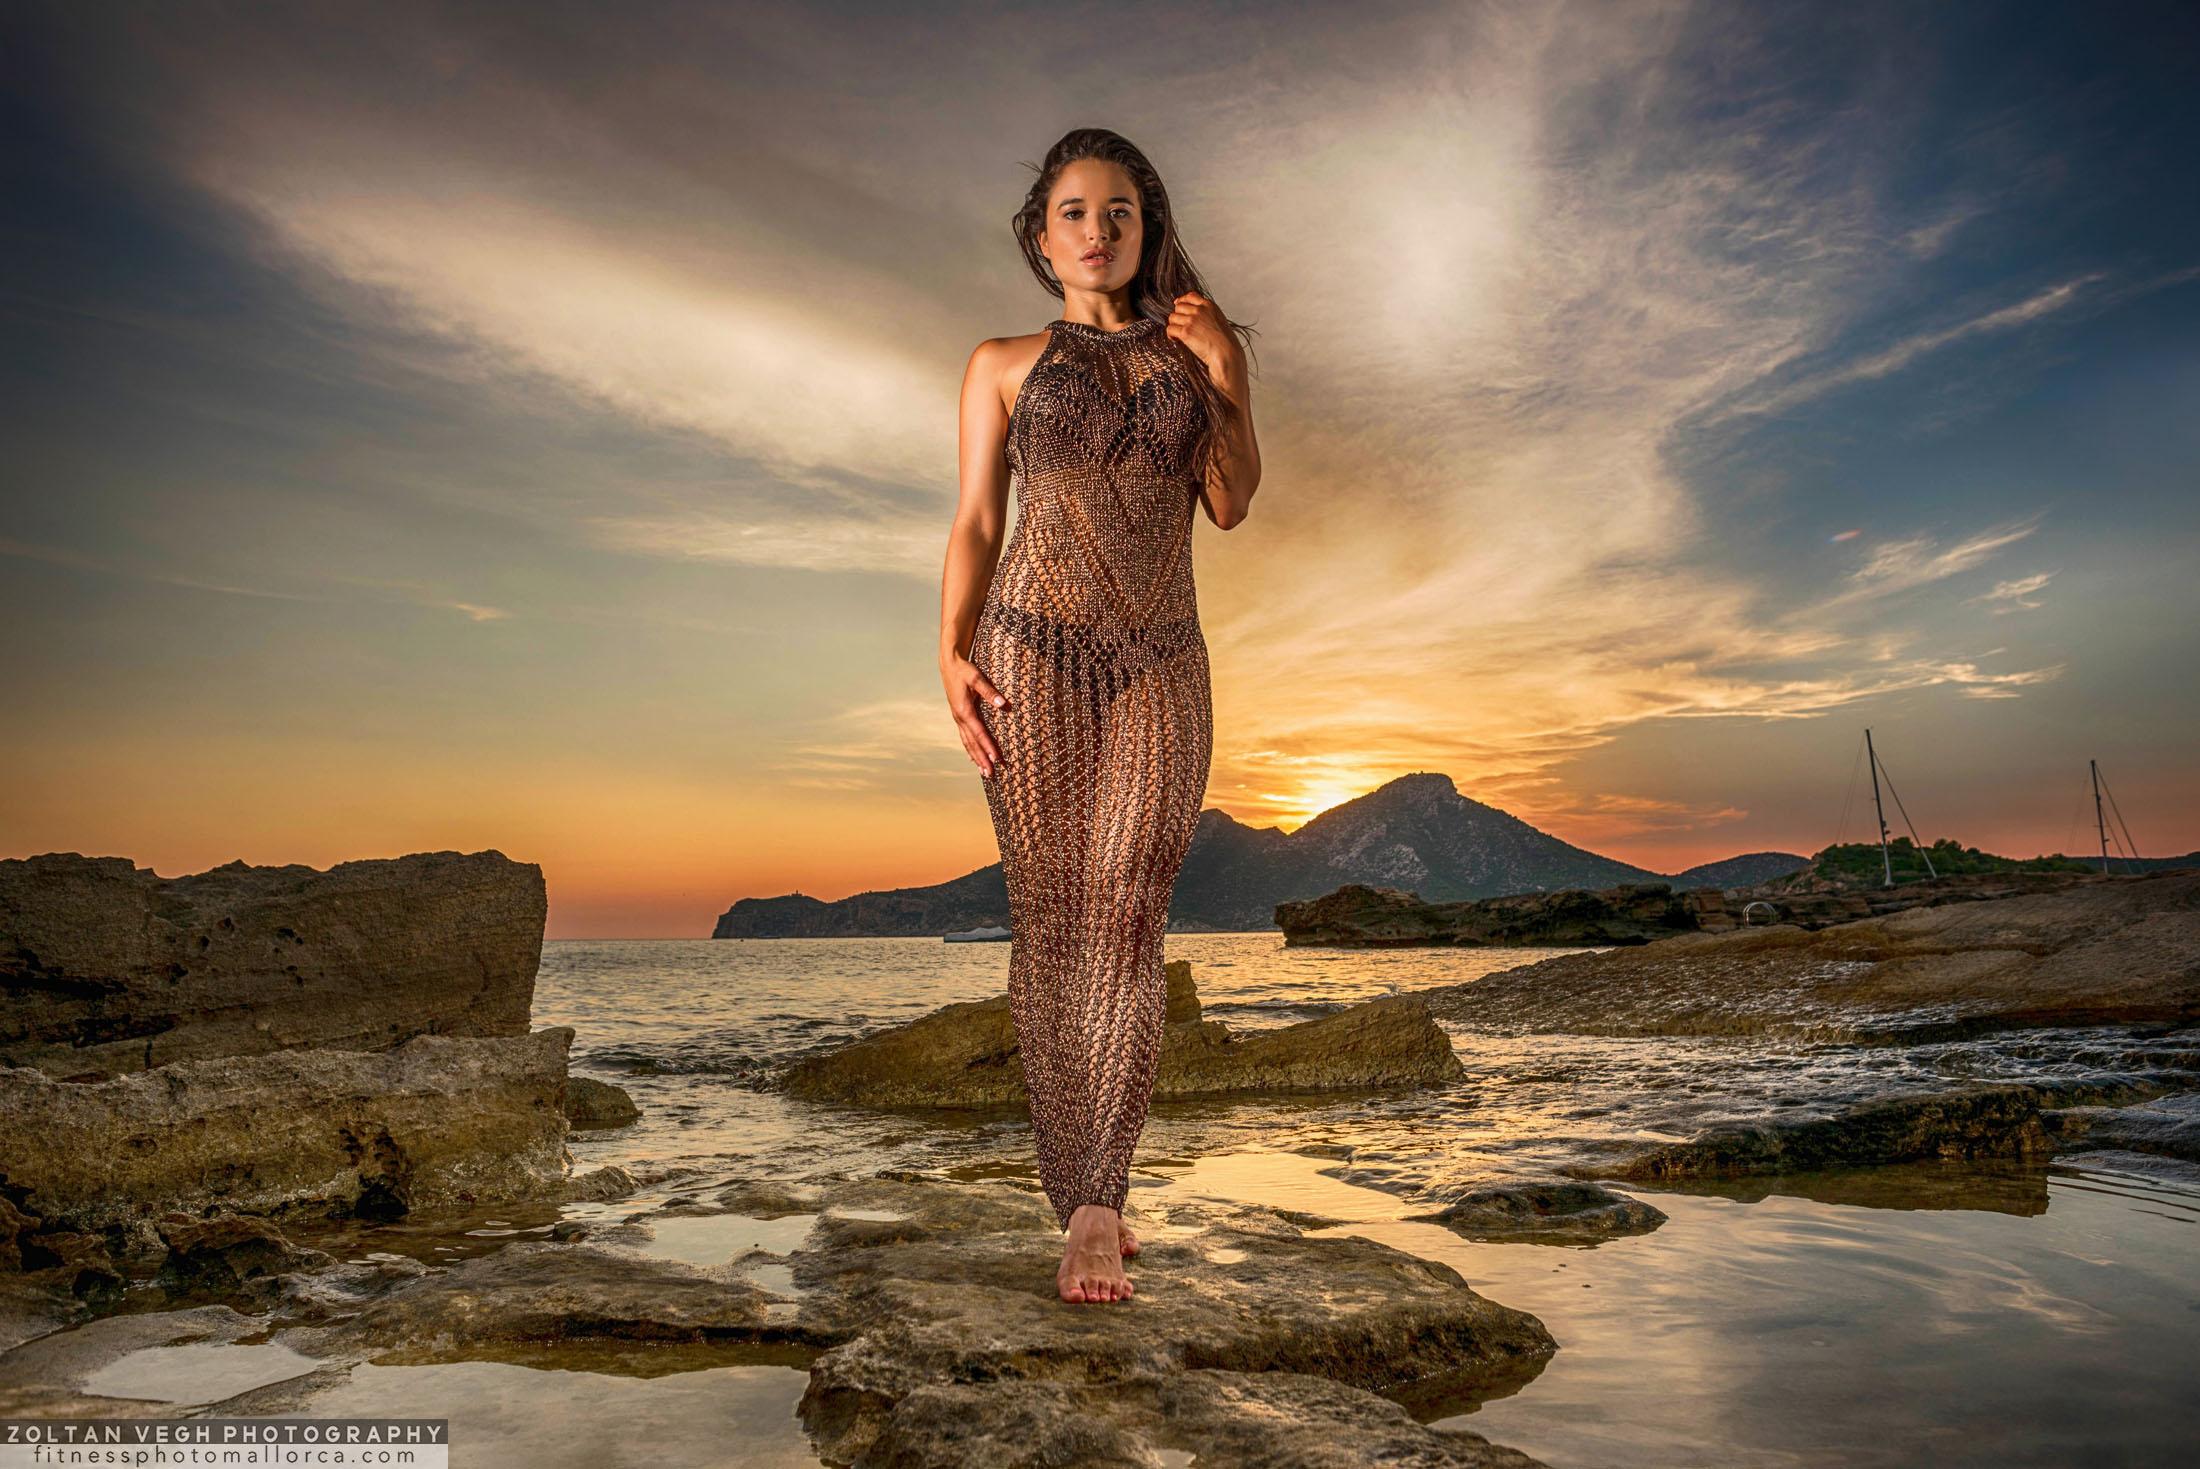 mallorca-photographer111.jpg